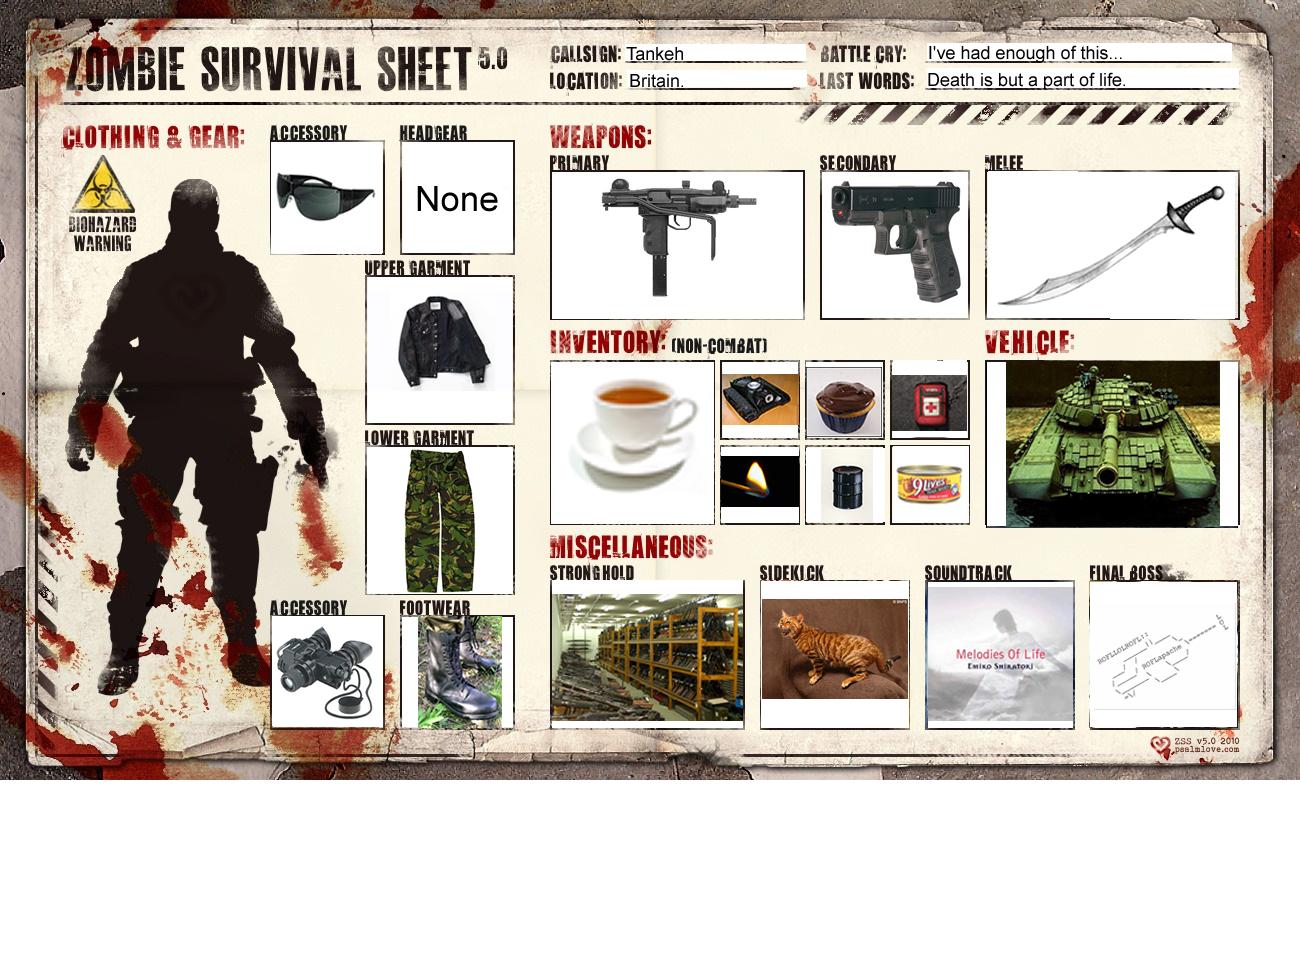 Earthquake clipart survival kit. Jil s soup buy